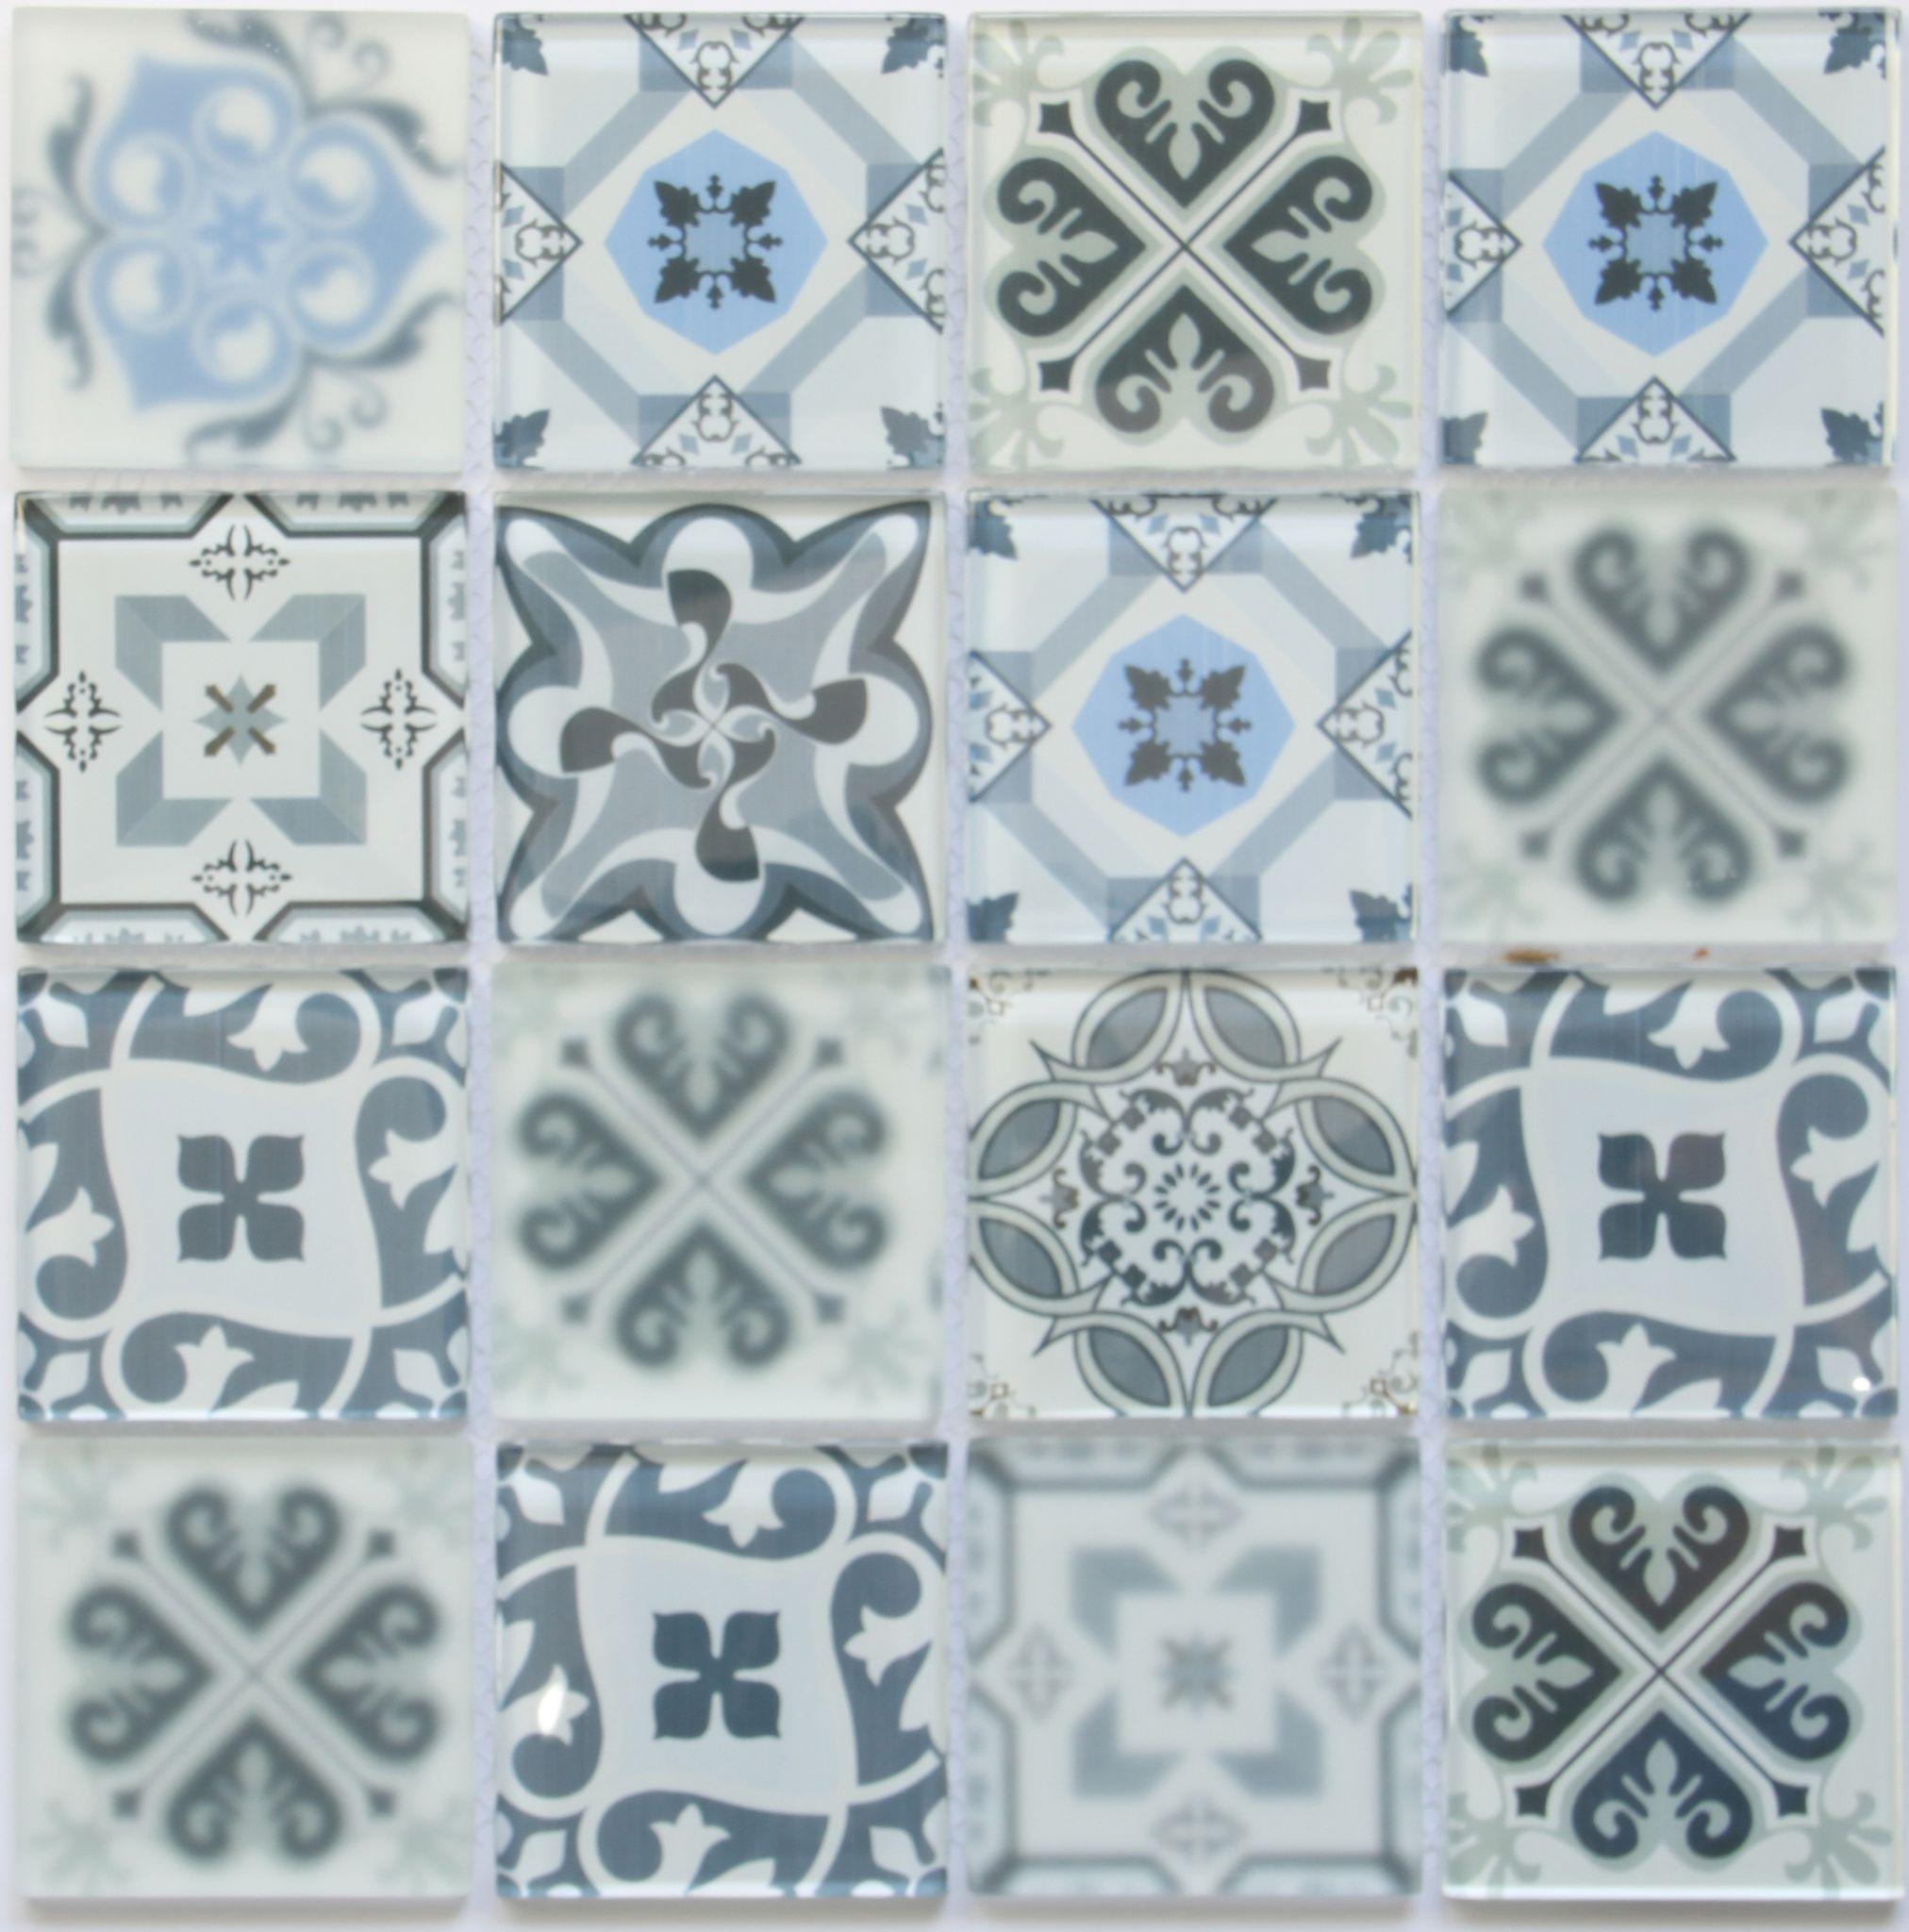 BLUE WHITE & GREY MURCIA ENCAUSTIC GLASS MOSAIC TILE